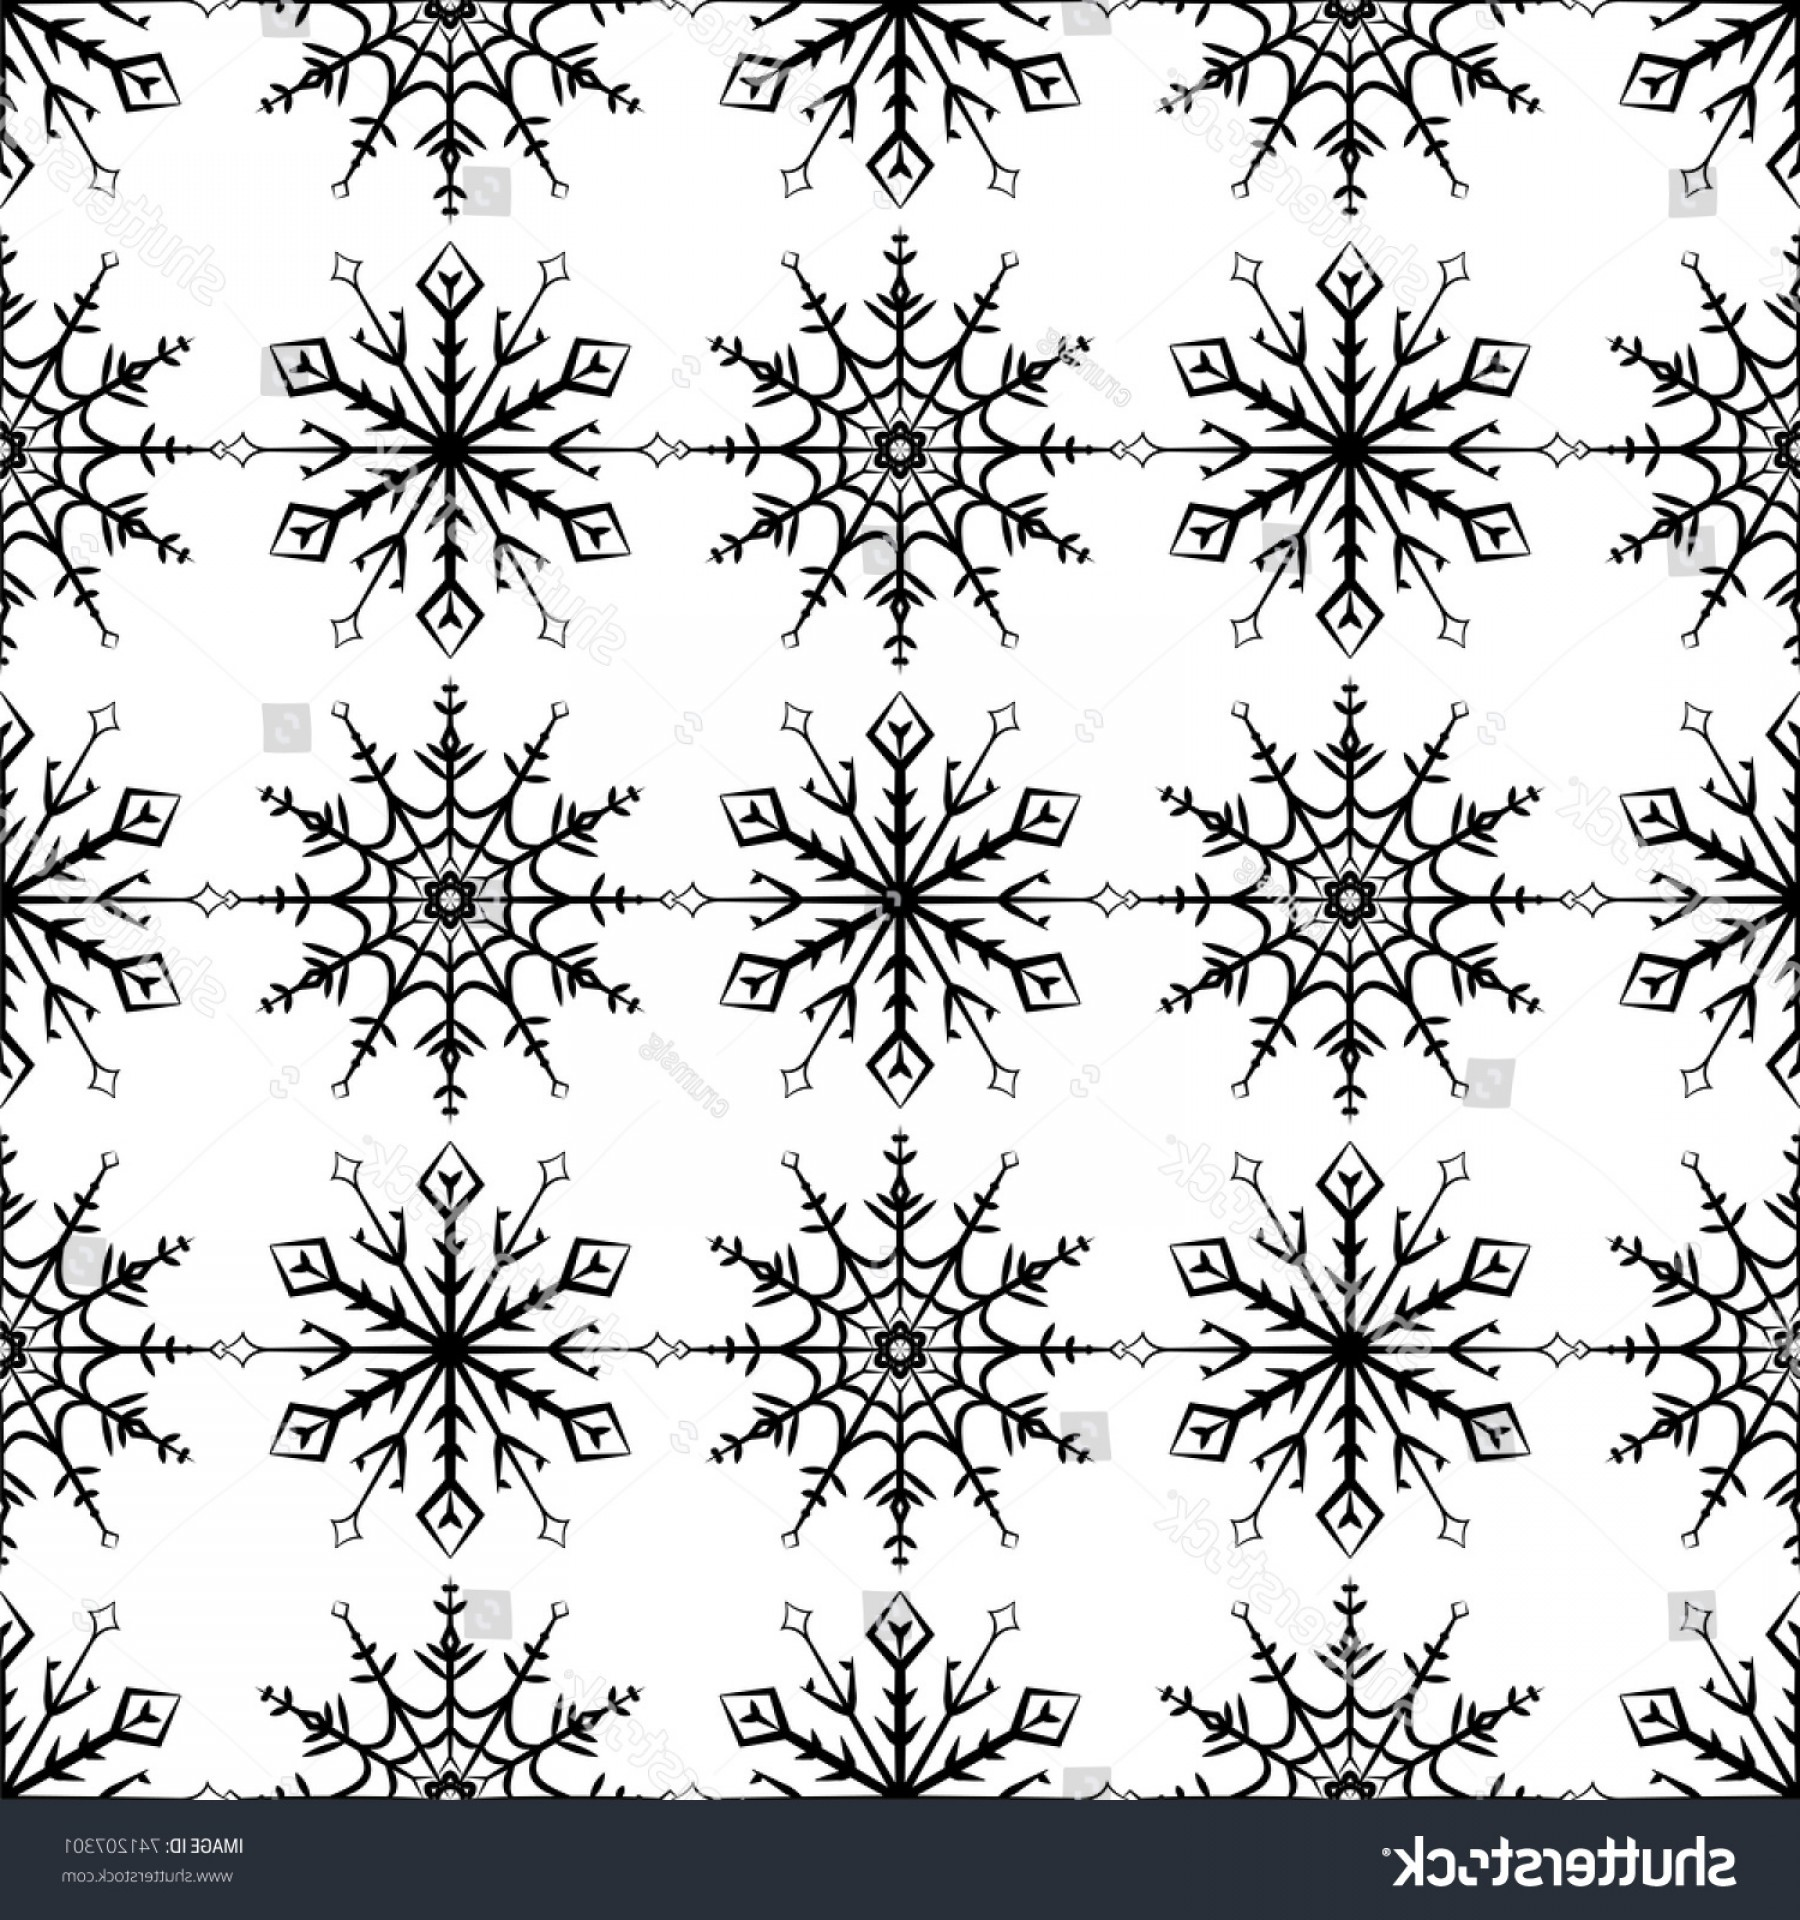 1800x1920 Christmas Snowflakes Vector Pattern Black White Geekchicpro